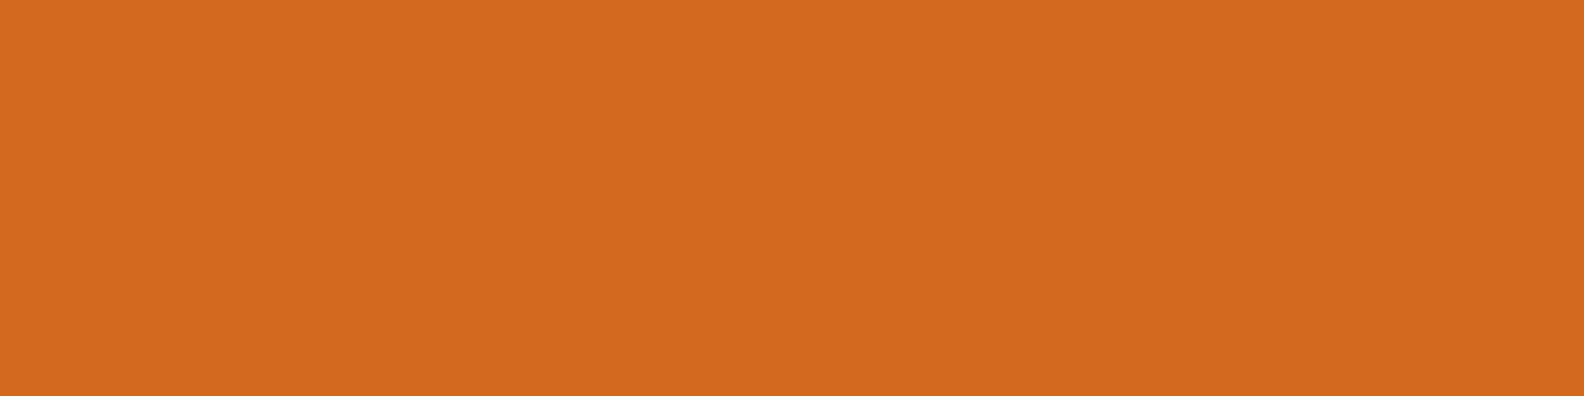 1584x396 Cinnamon Solid Color Background